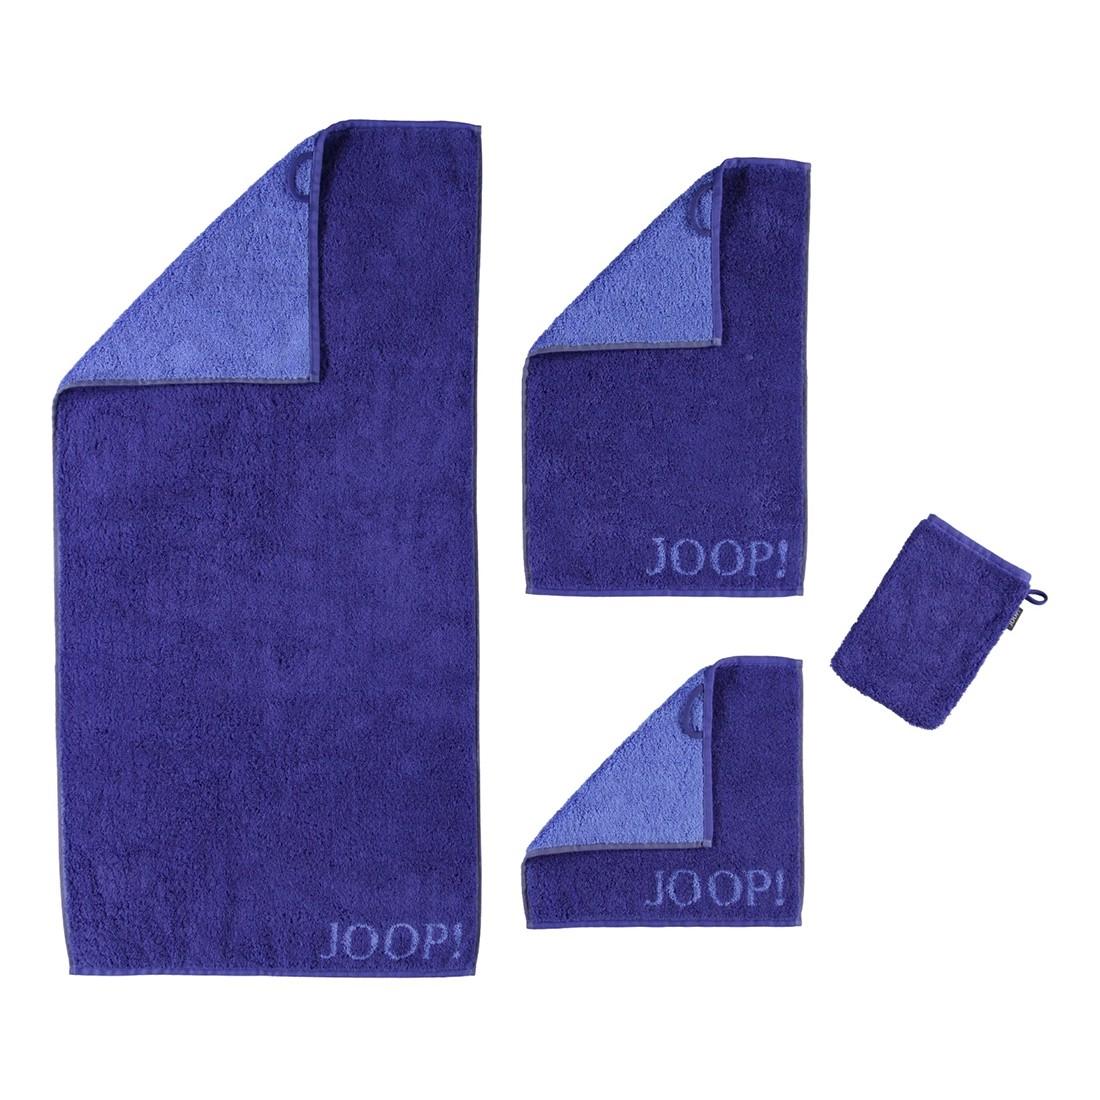 Handtuch Classic Doubleface – 100% Baumwolle StahlBlau – 10 – Duschtuch: 80 x 150 cm, Joop online bestellen